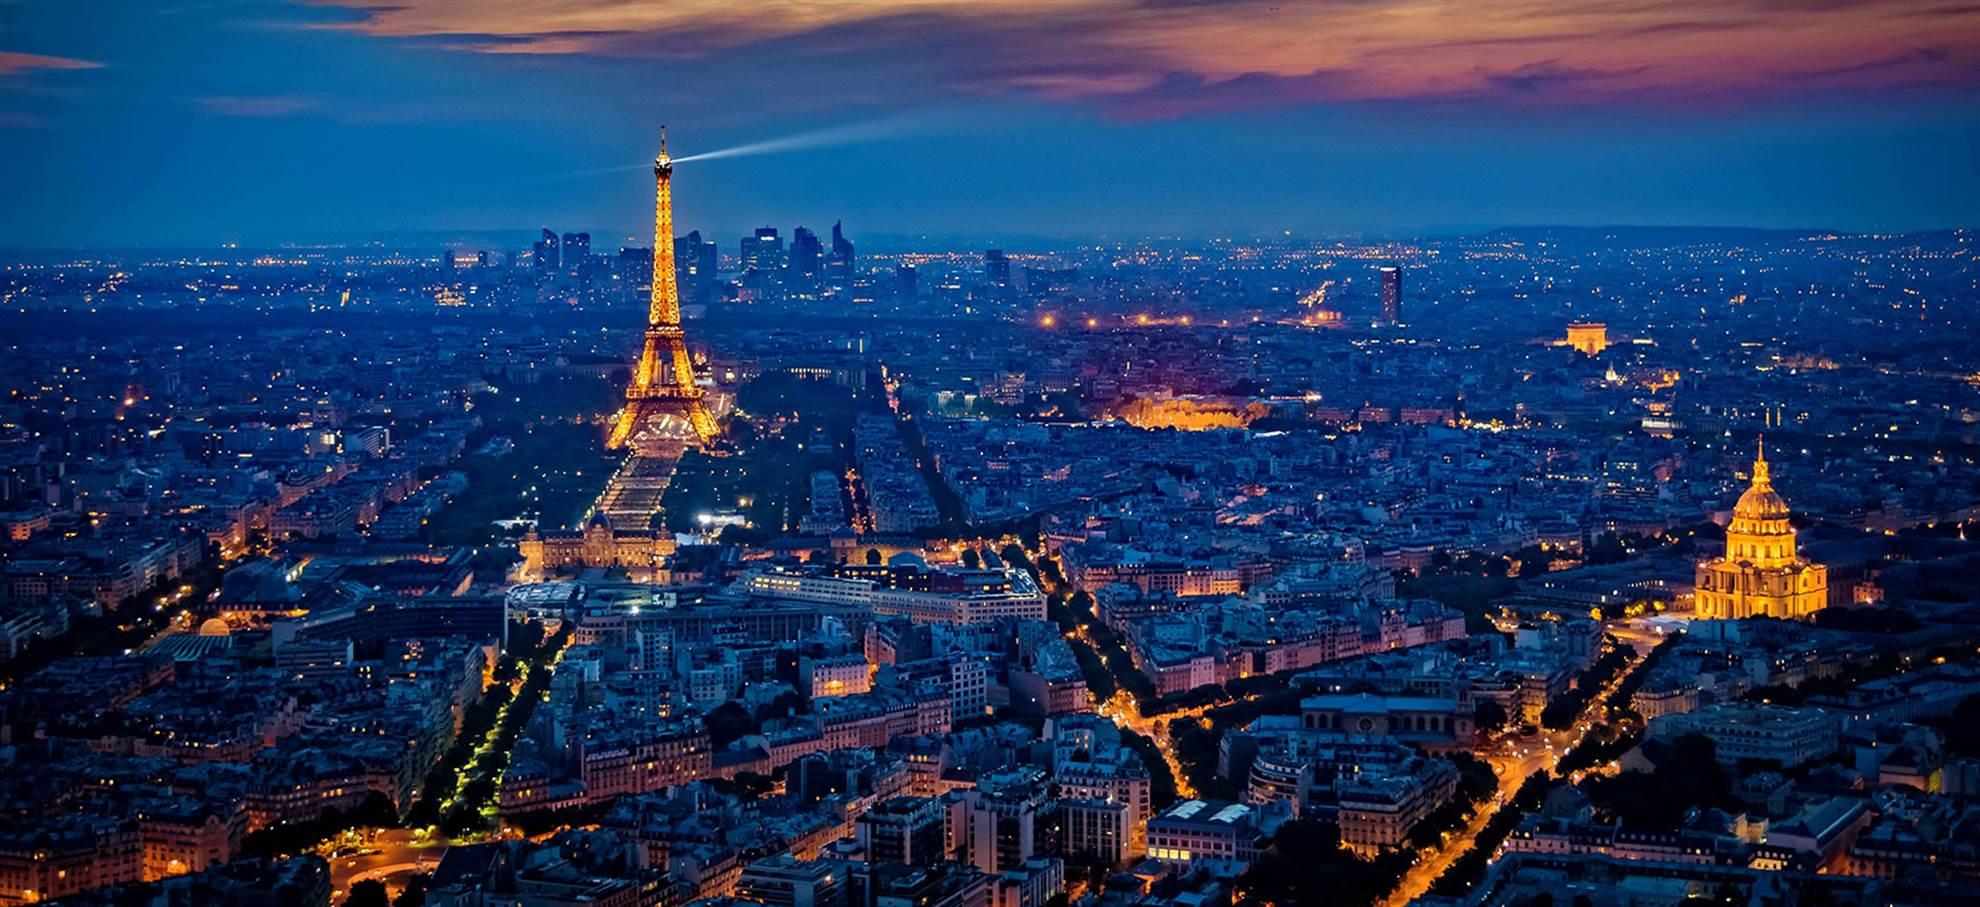 Paris Illuminations in a open top bus